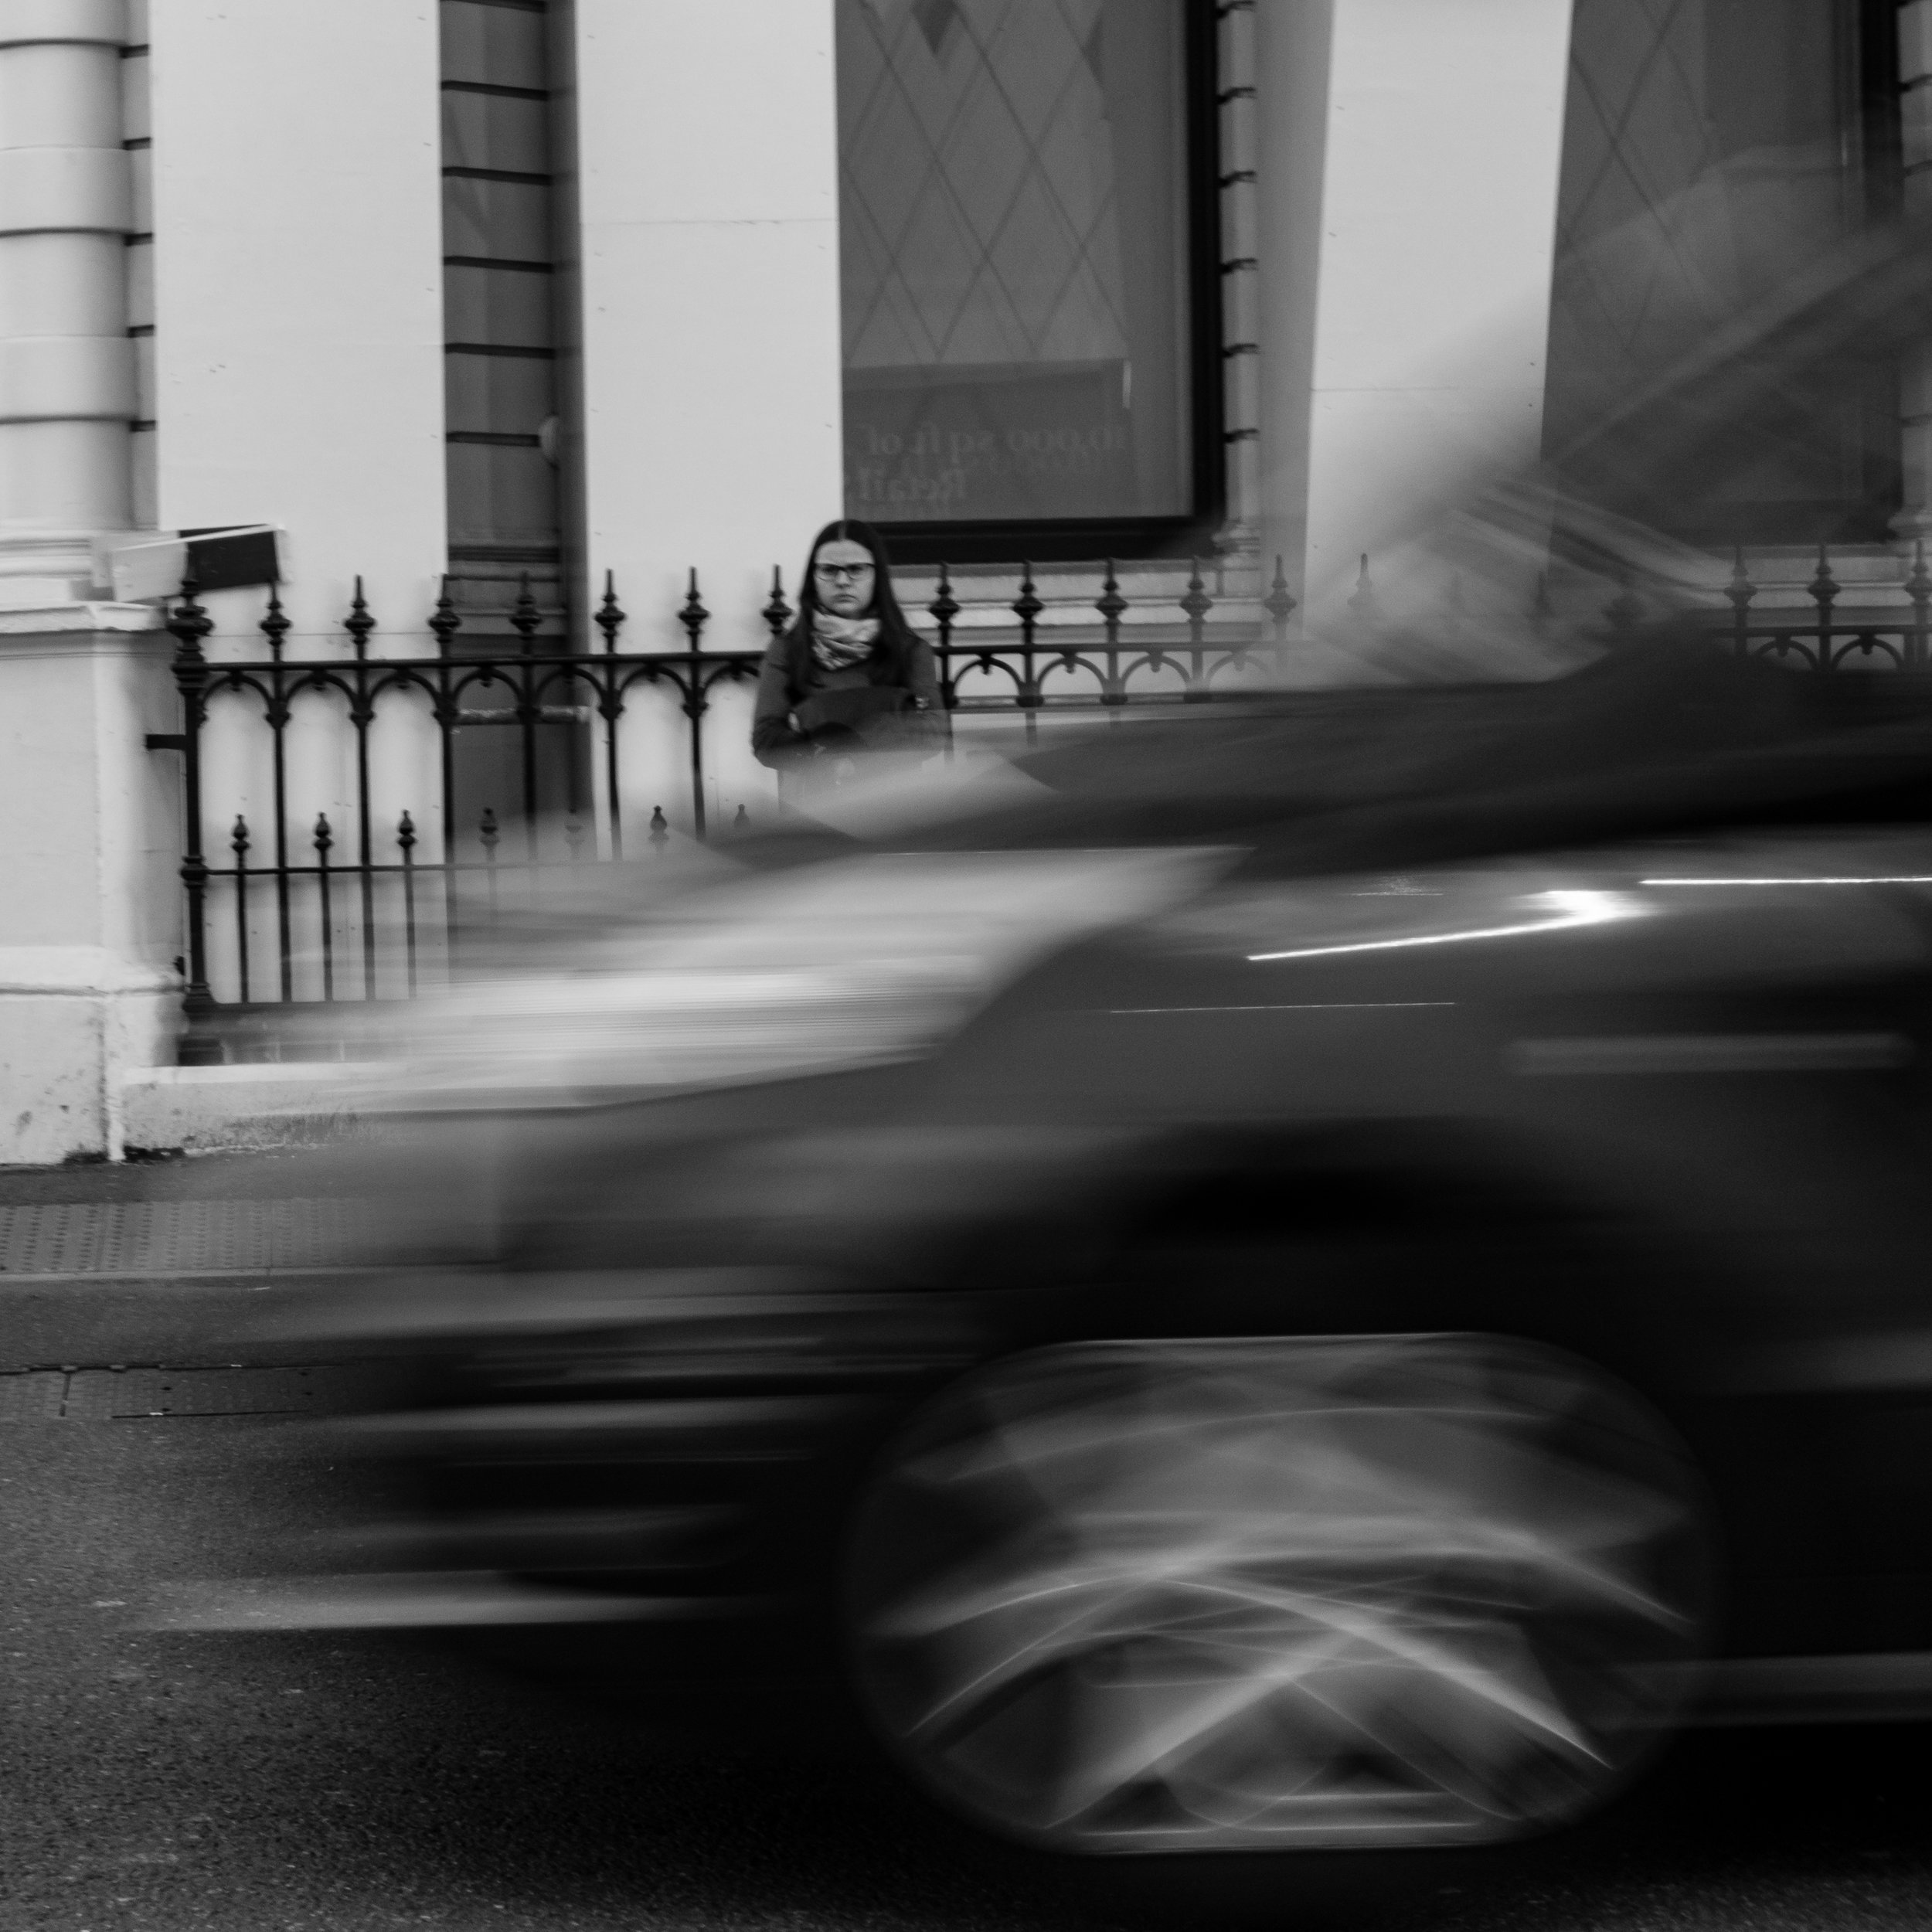 street_london_2018 (11 of 19).jpg